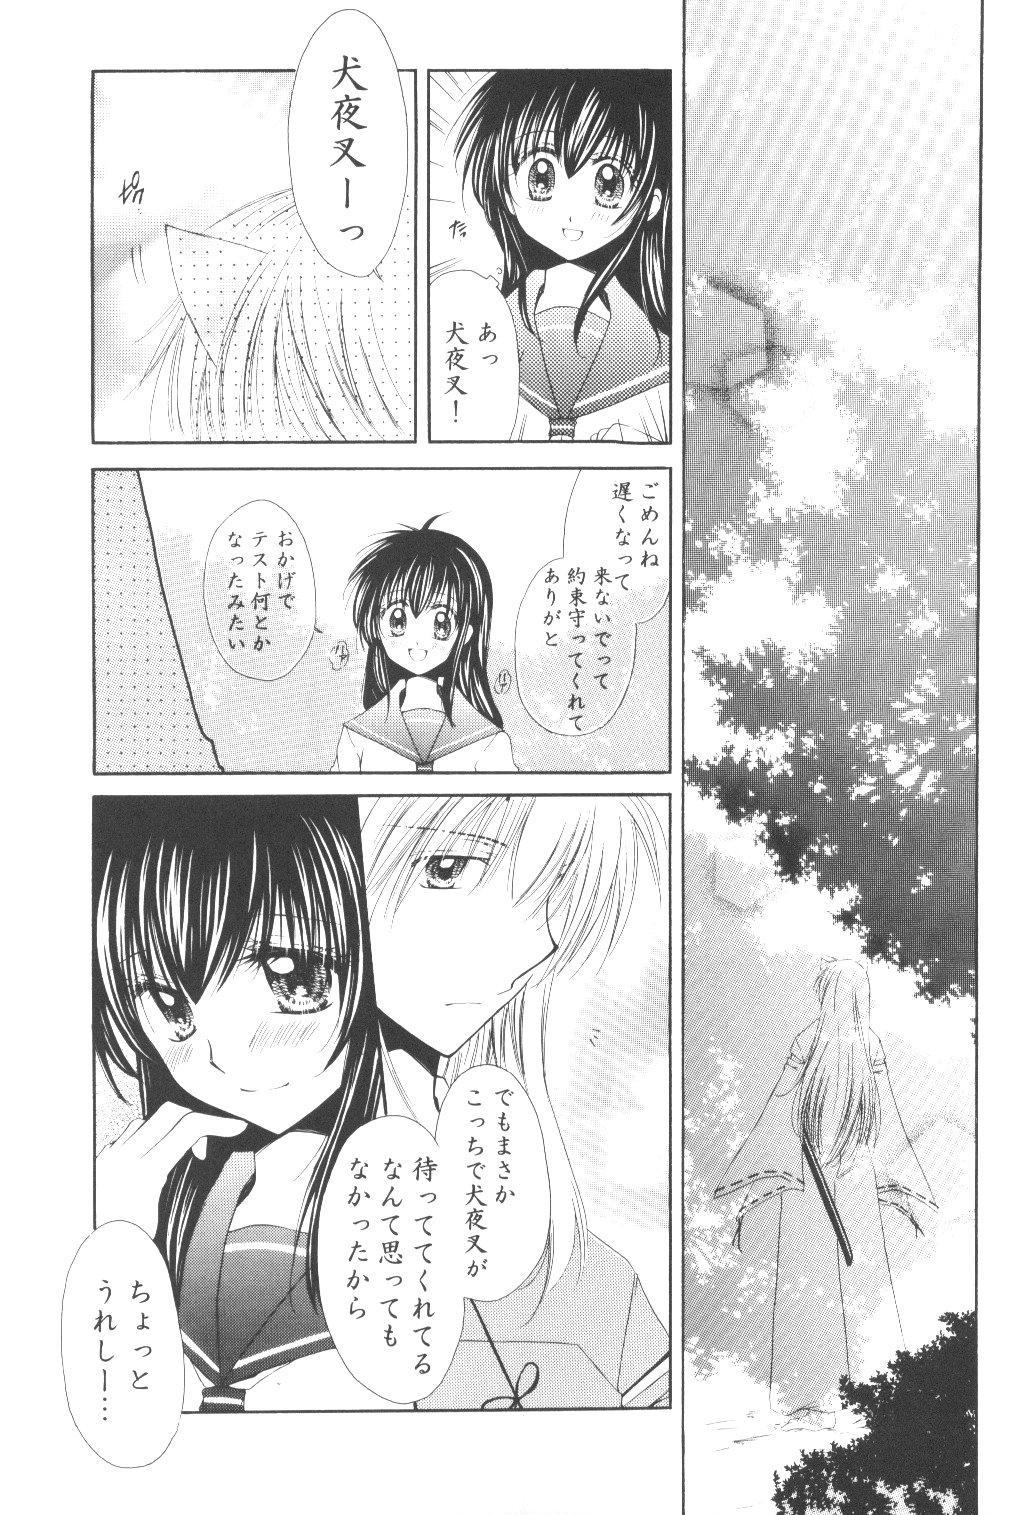 Ryuusei Ryodan 8